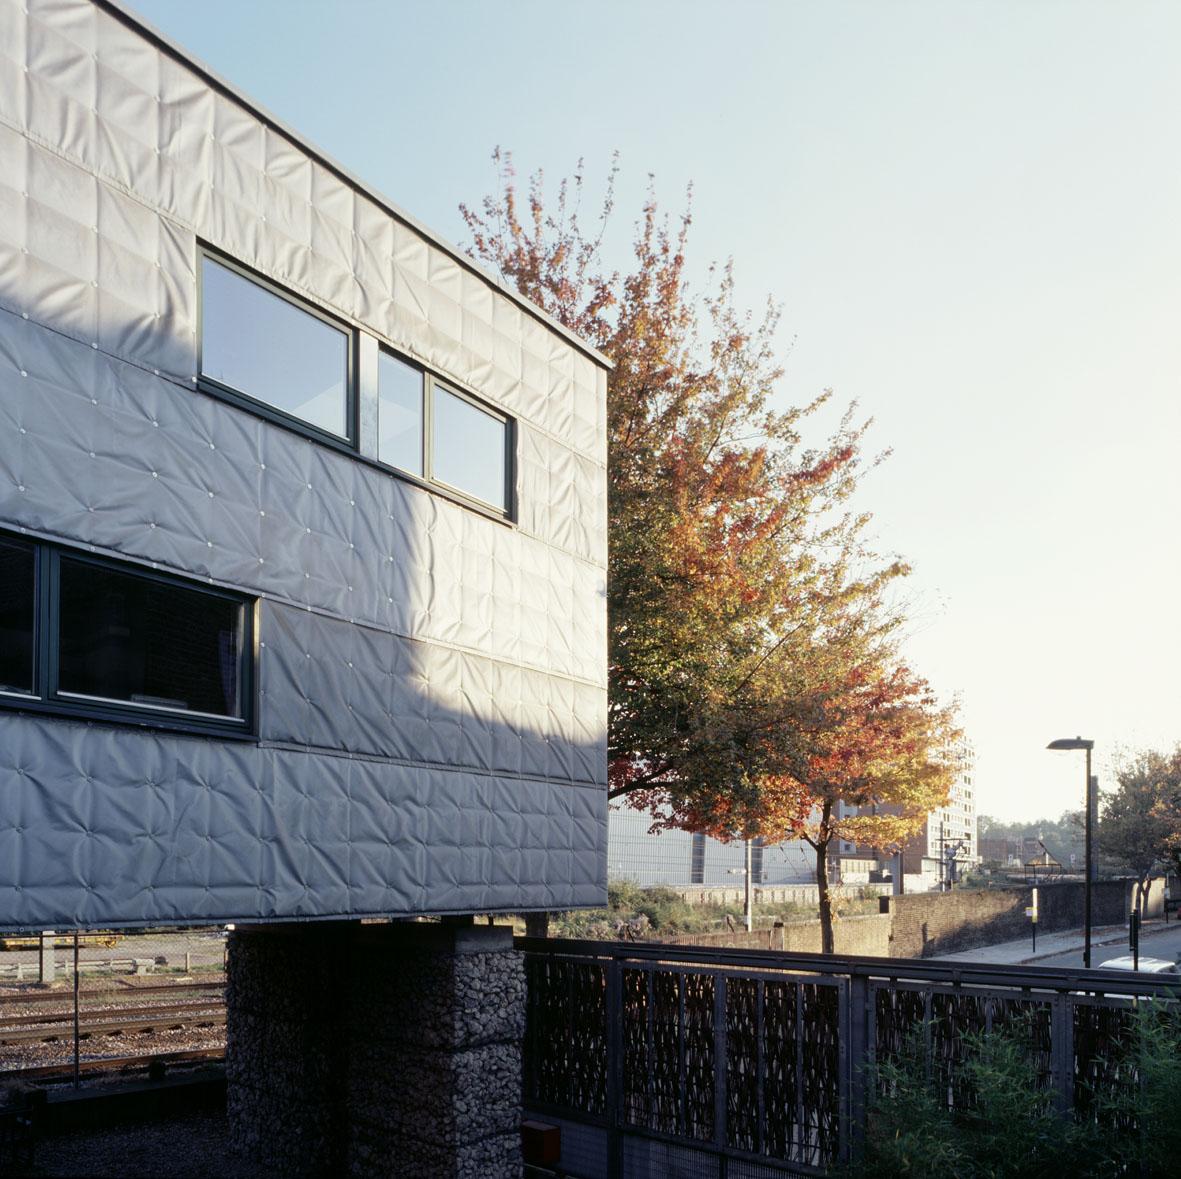 Sarah-Wigglesworth-Architects Stock Orchard Street cloth wall autumn 1800